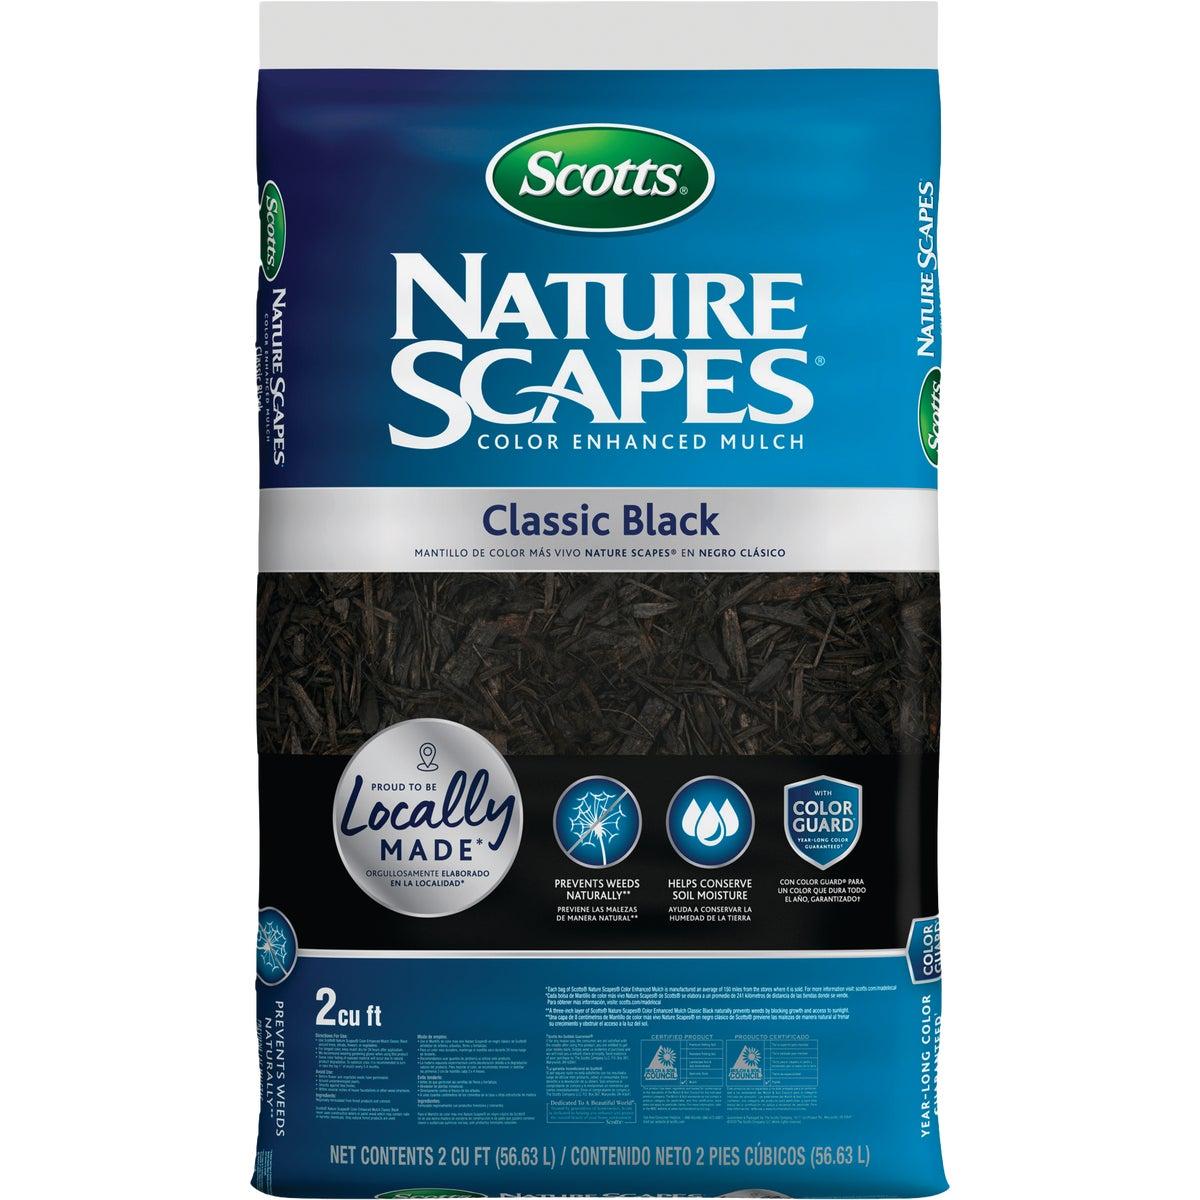 2CF N.SCAPES BLACK MULCH - 88552410 by Scotts Organics